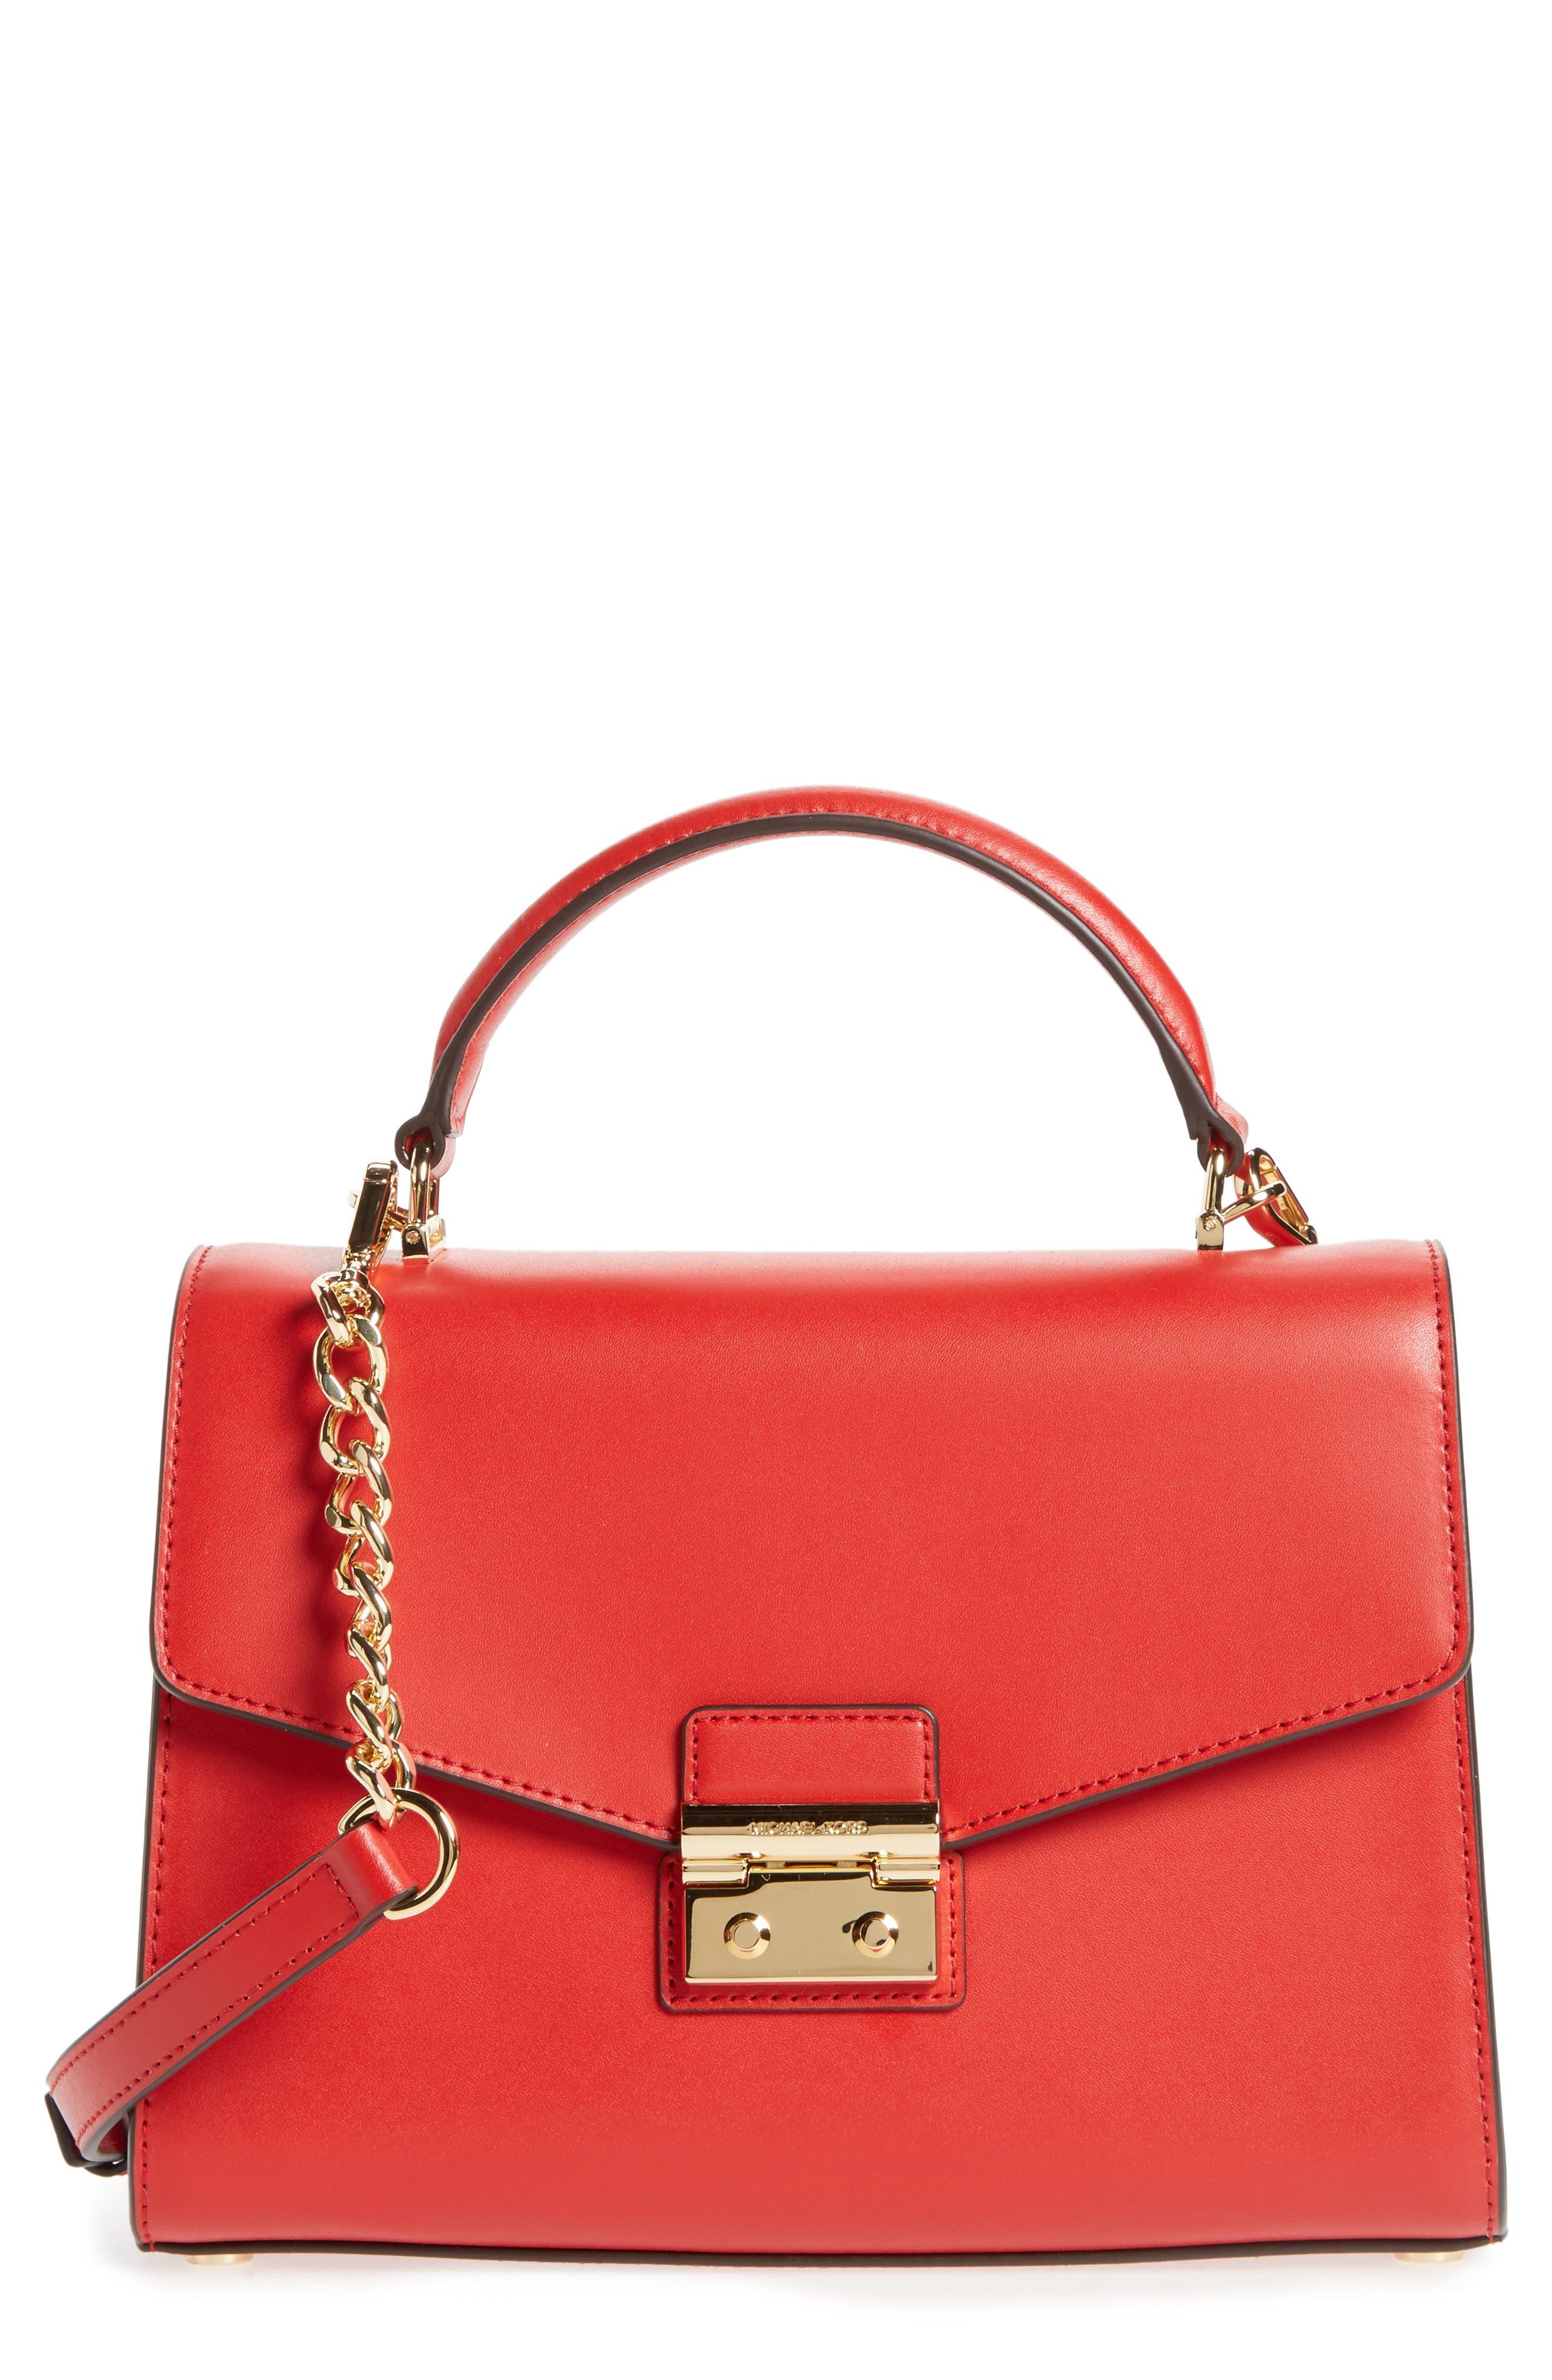 MICHAEL Michael Kors Medium Sloan Leather Satchel,                             Main thumbnail 1, color,                             Bright Red